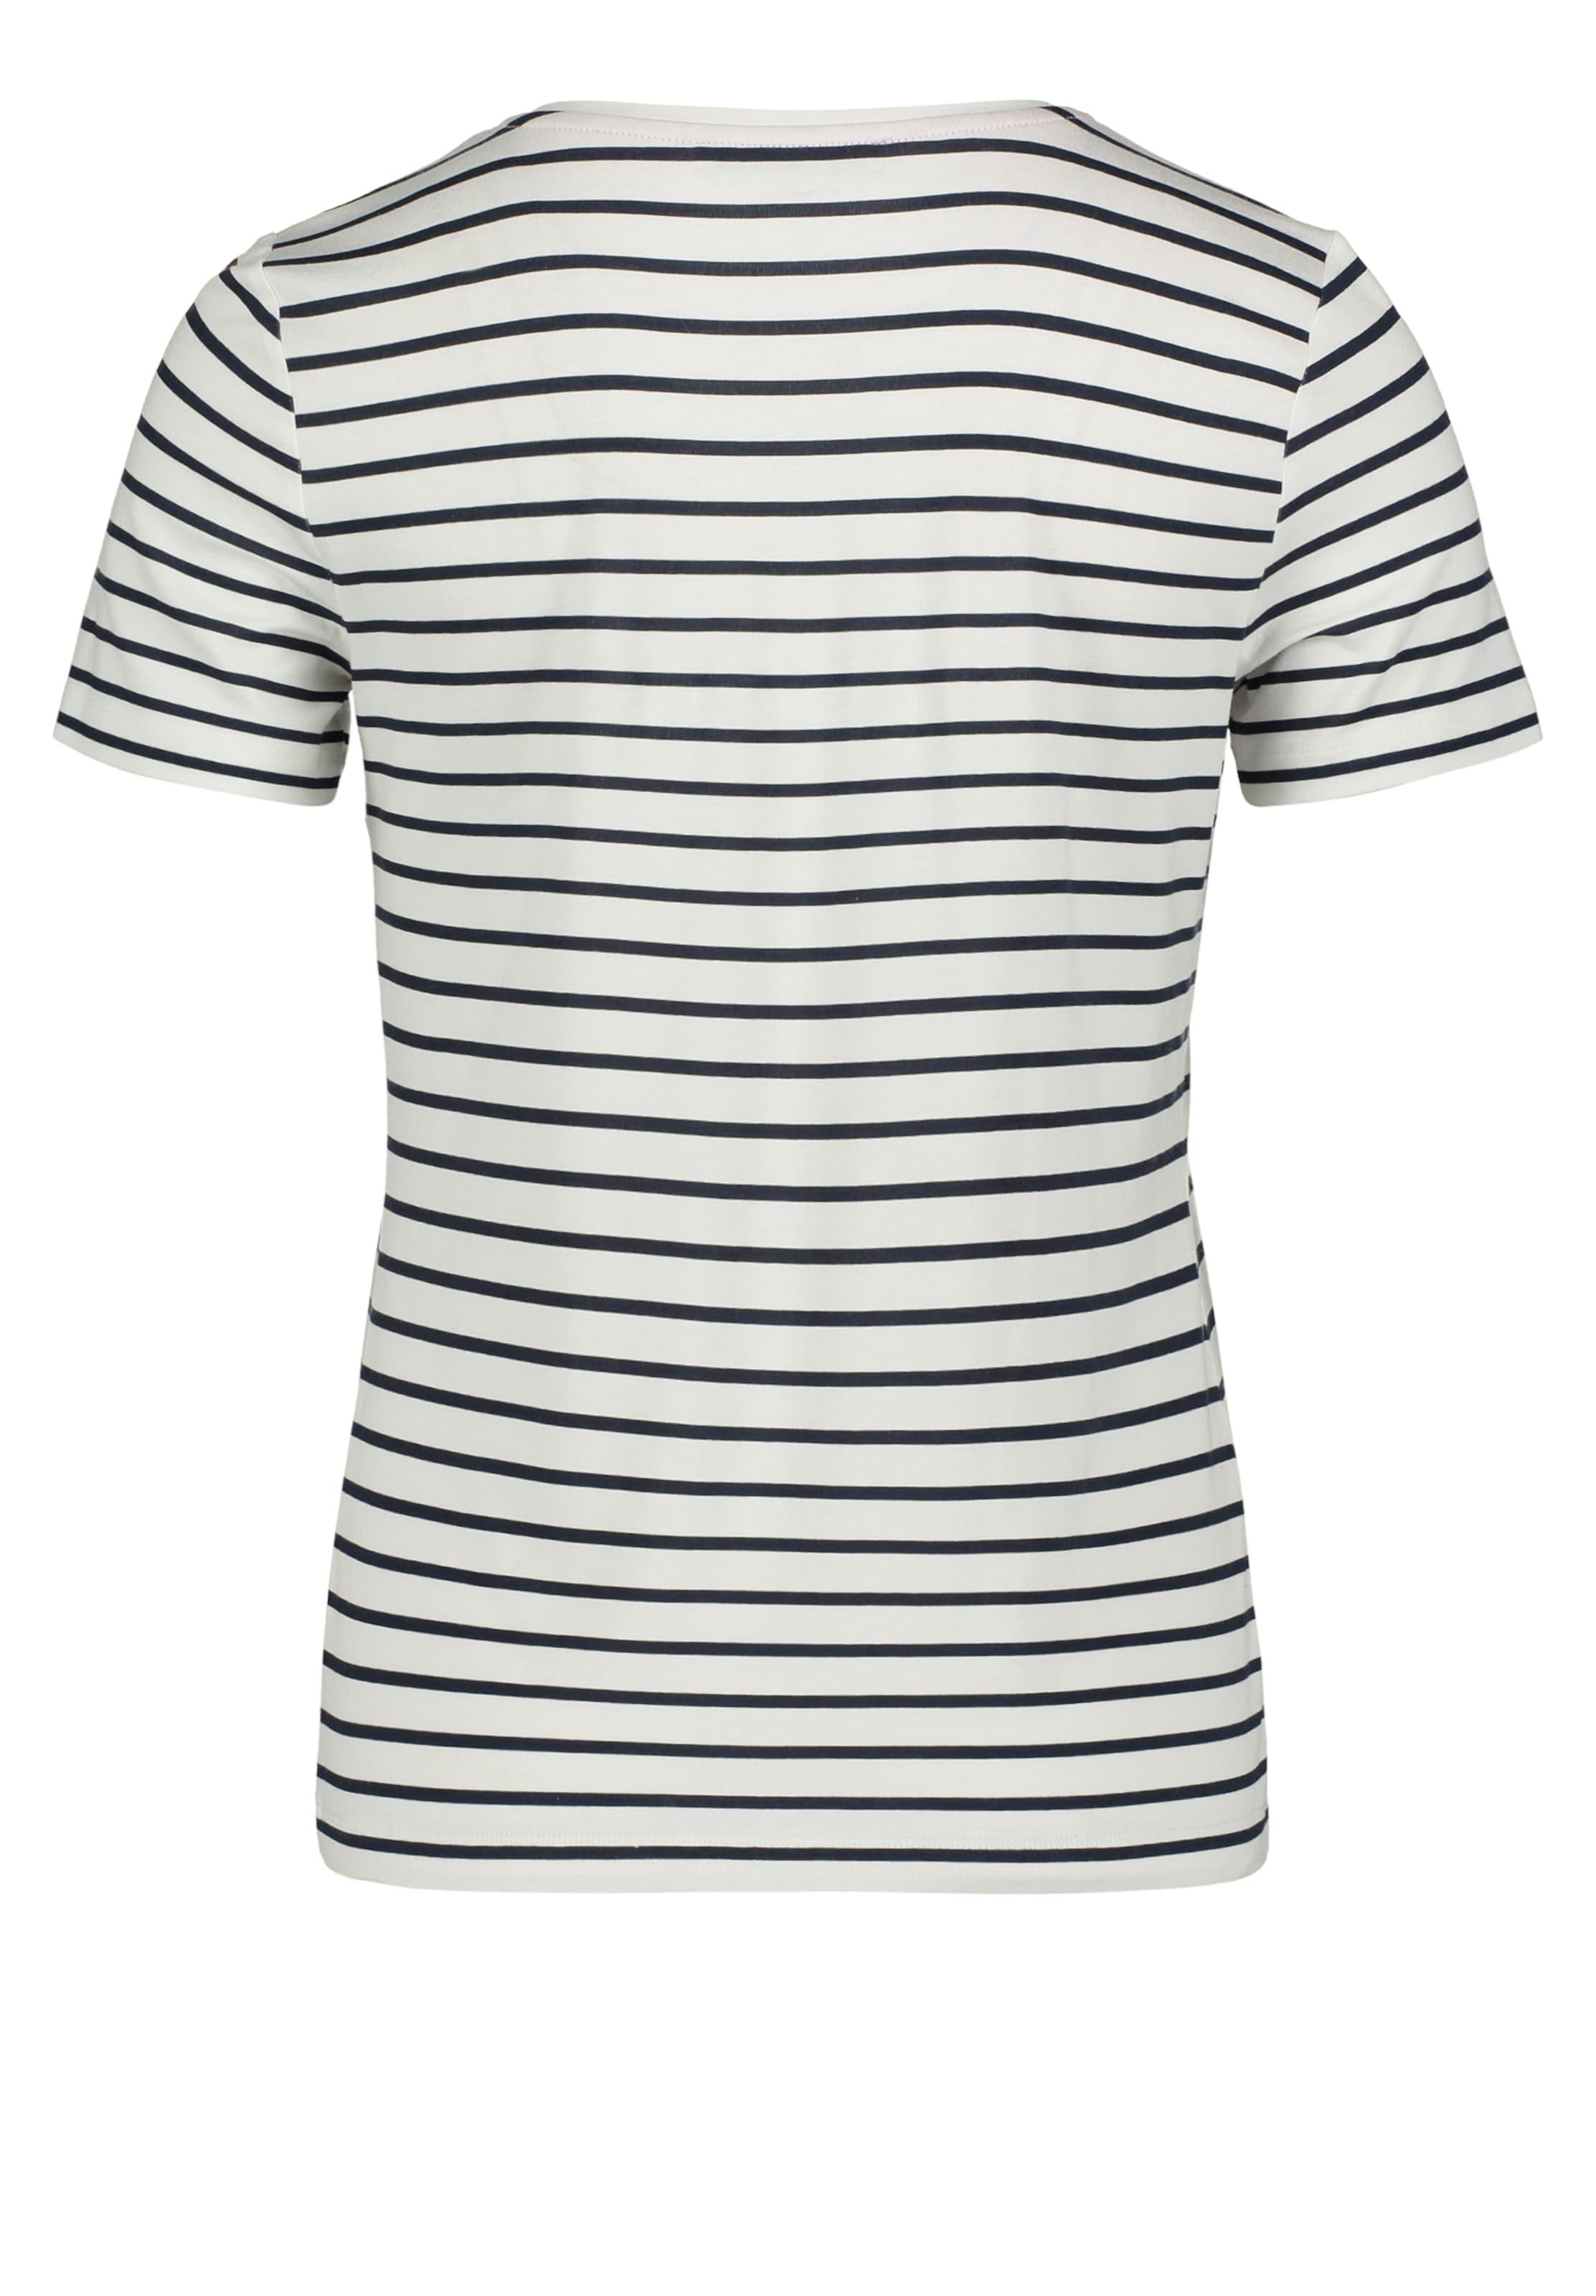 In NachtblauMischfarben Offwhite Shirt Betty Barclay u3TlJK1cF